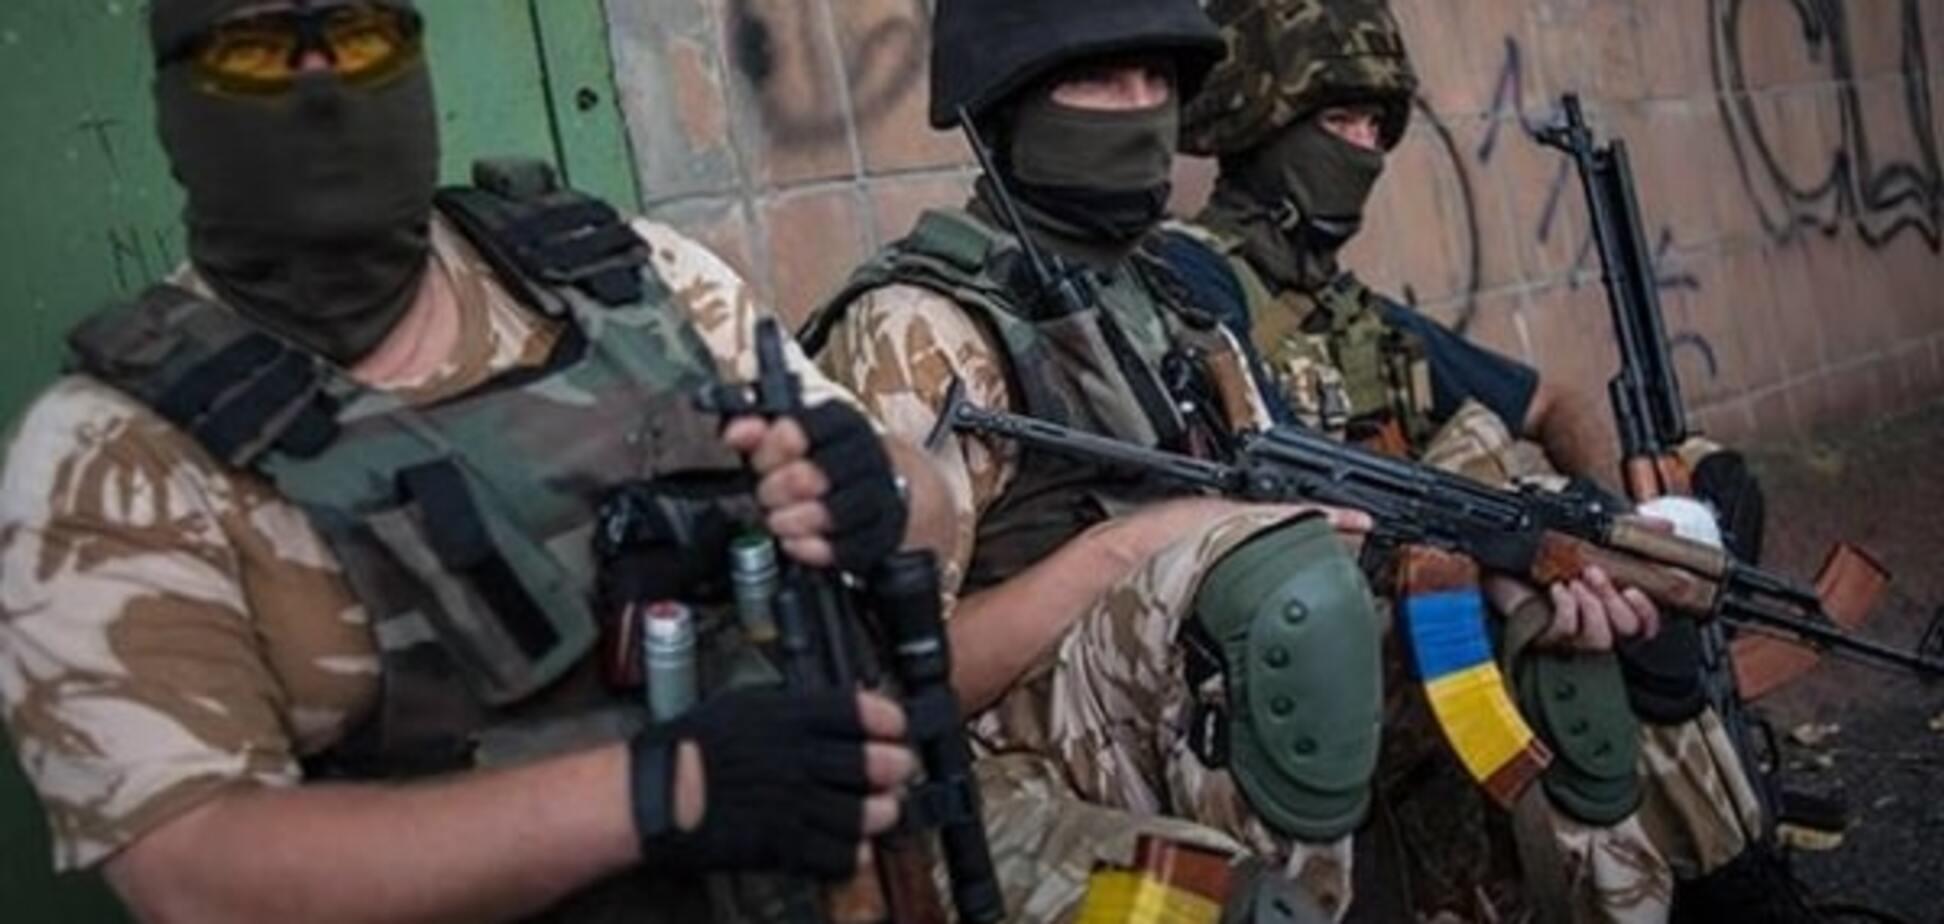 Терористи атакували сили АТО в п'яти населених пунктах